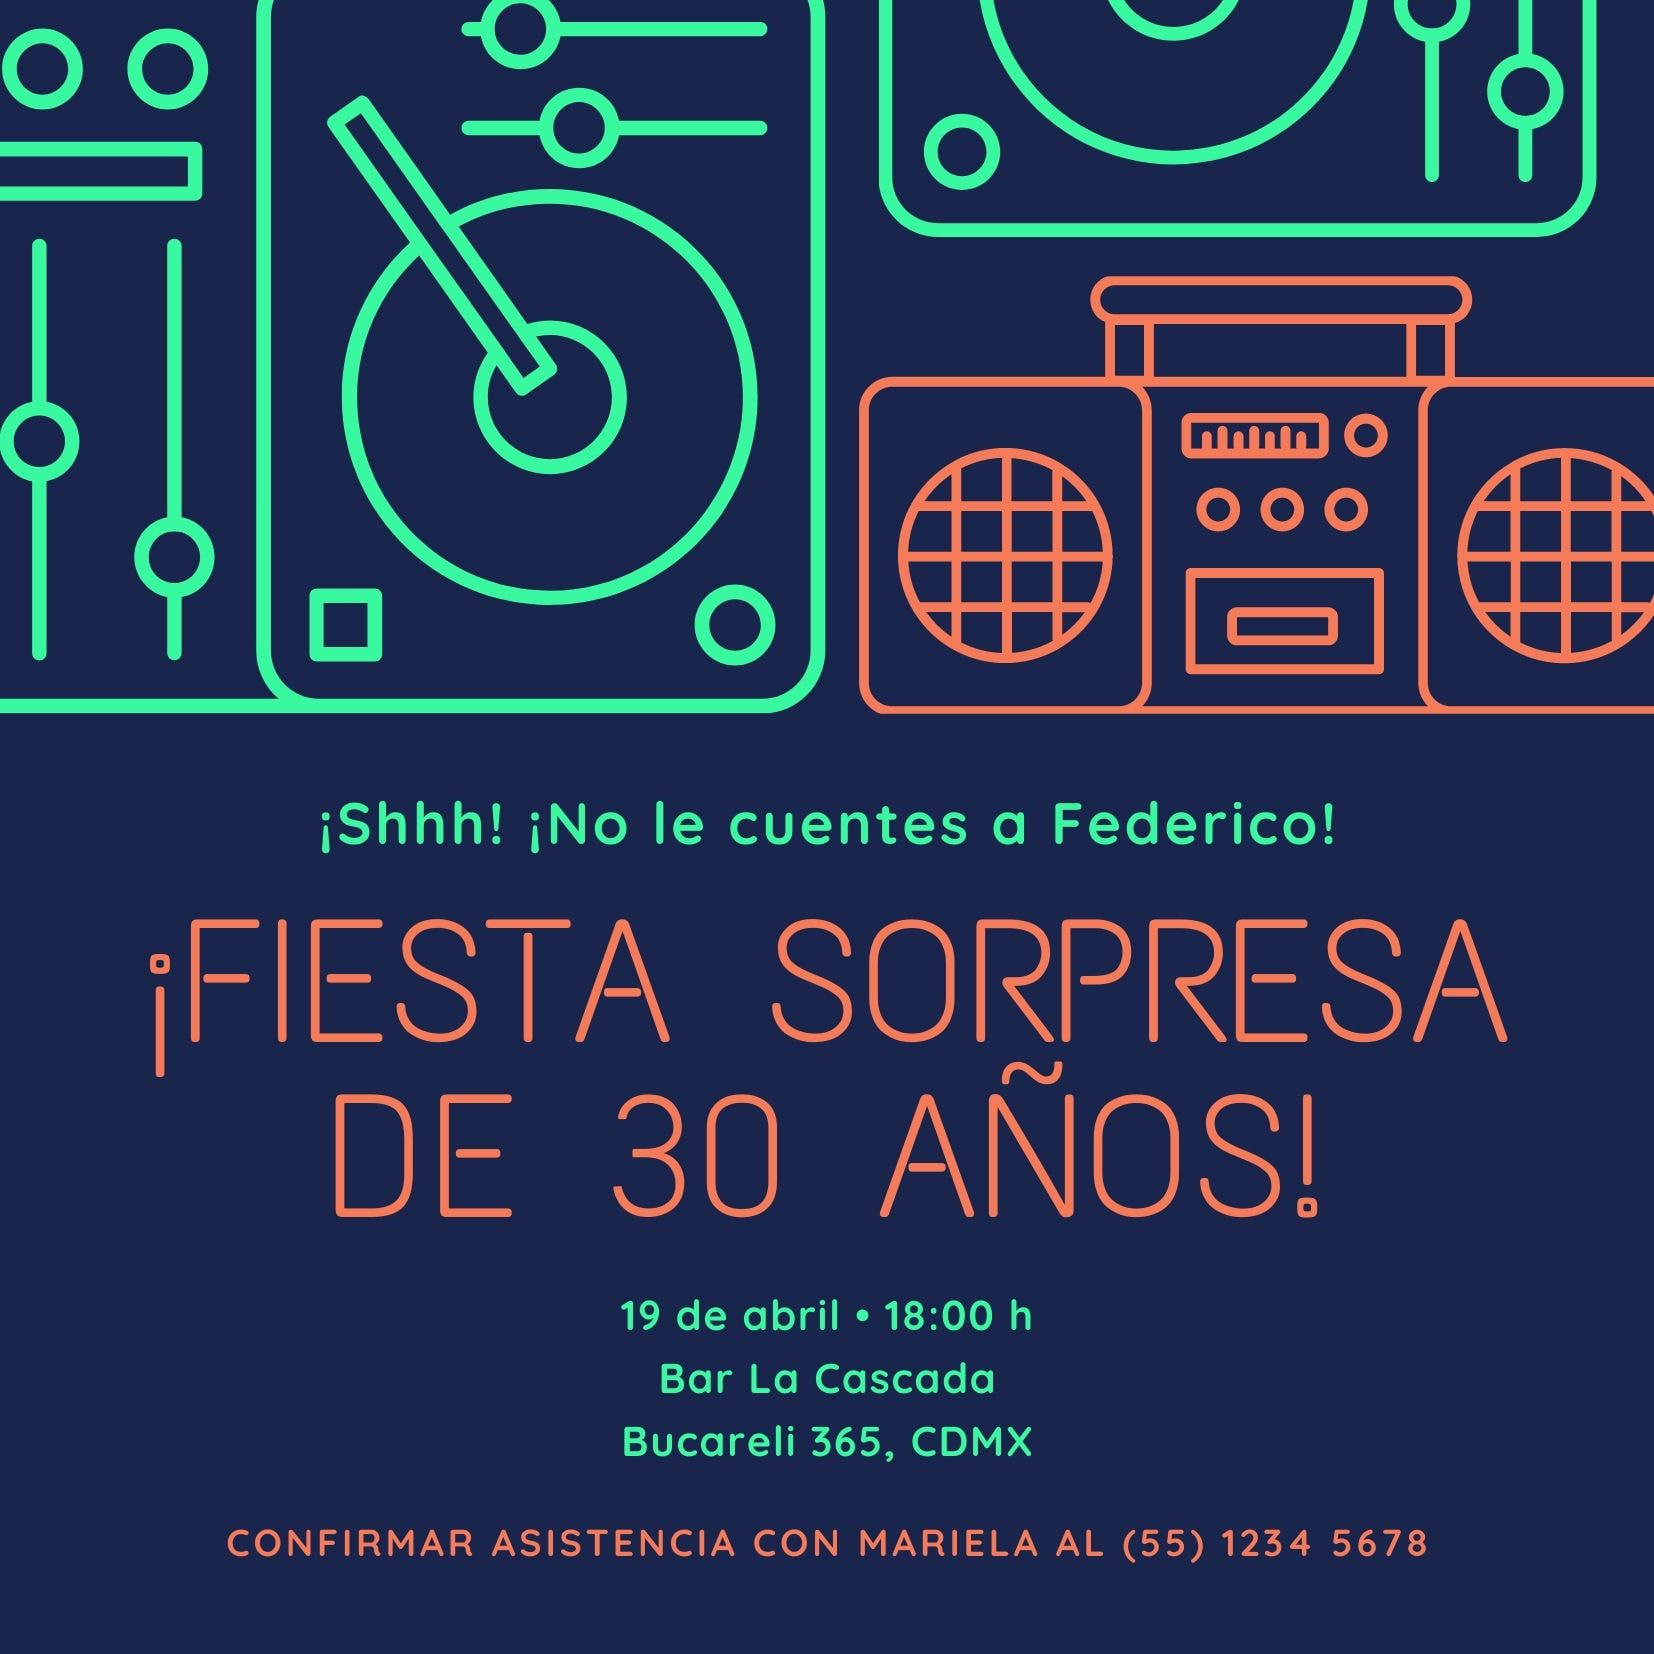 Neón Música Fiesta Sorpresa Invitación